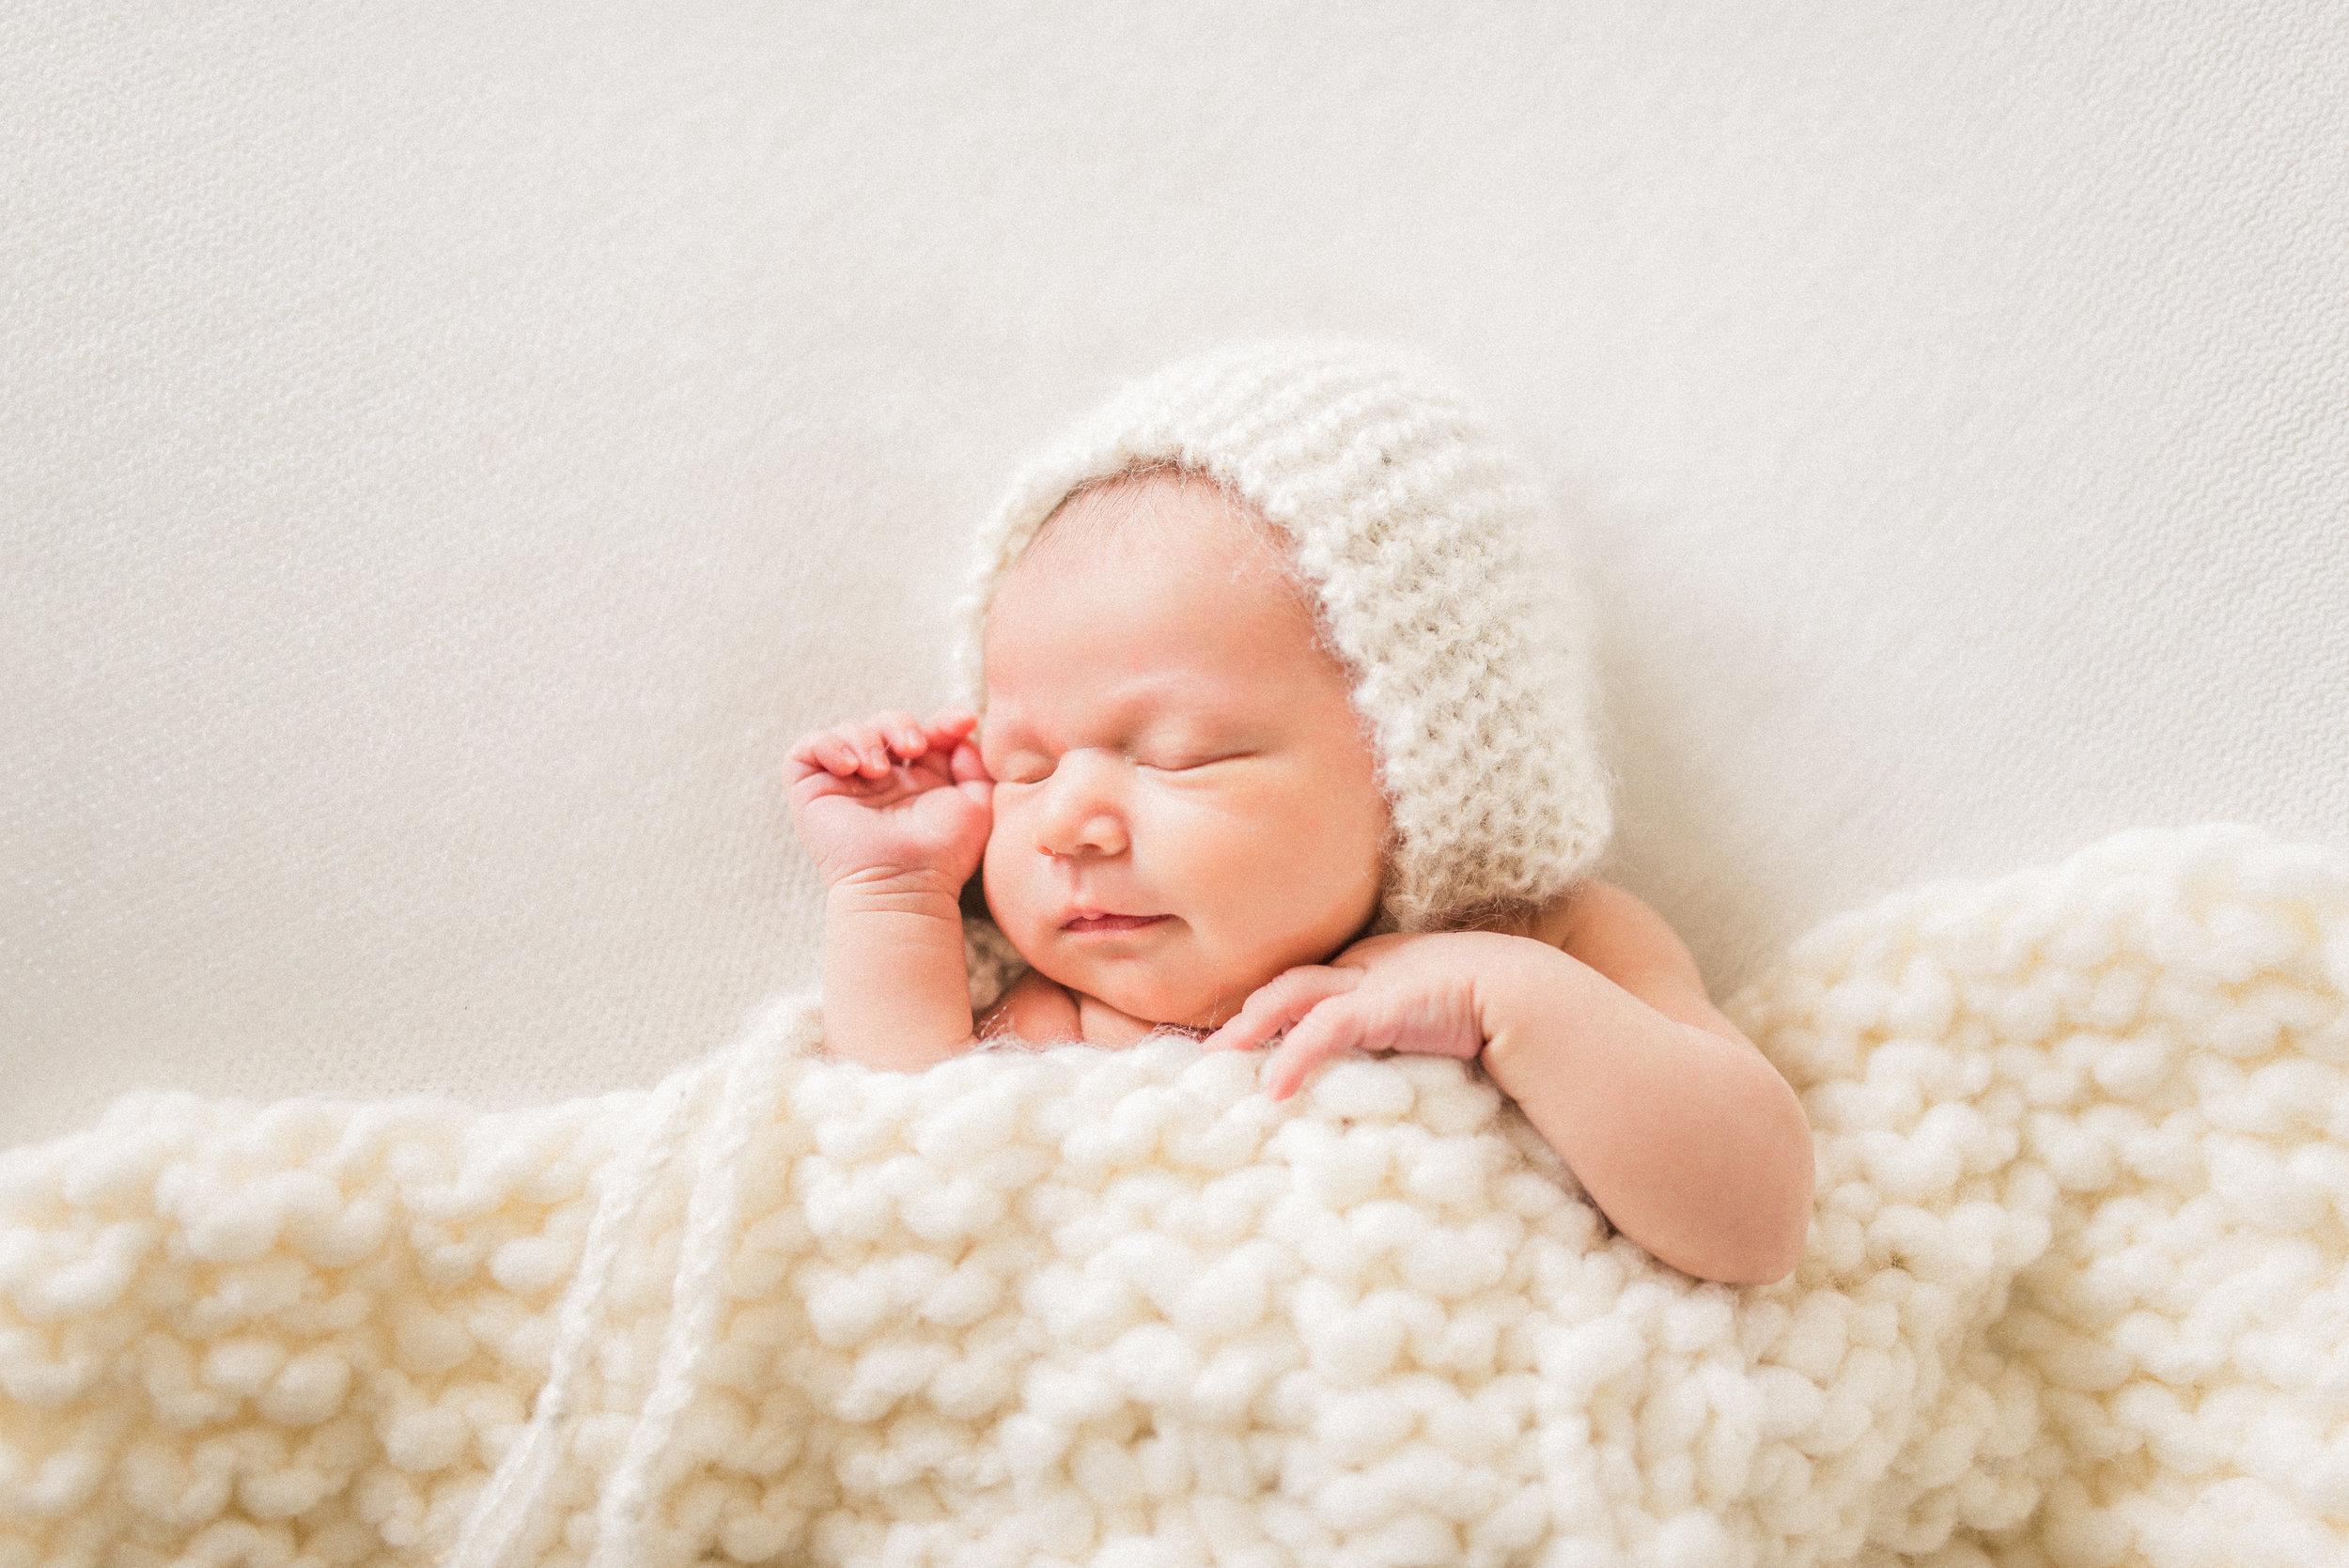 Olivia | Cozy & Bright Newborn Photography | Noblesville, IN